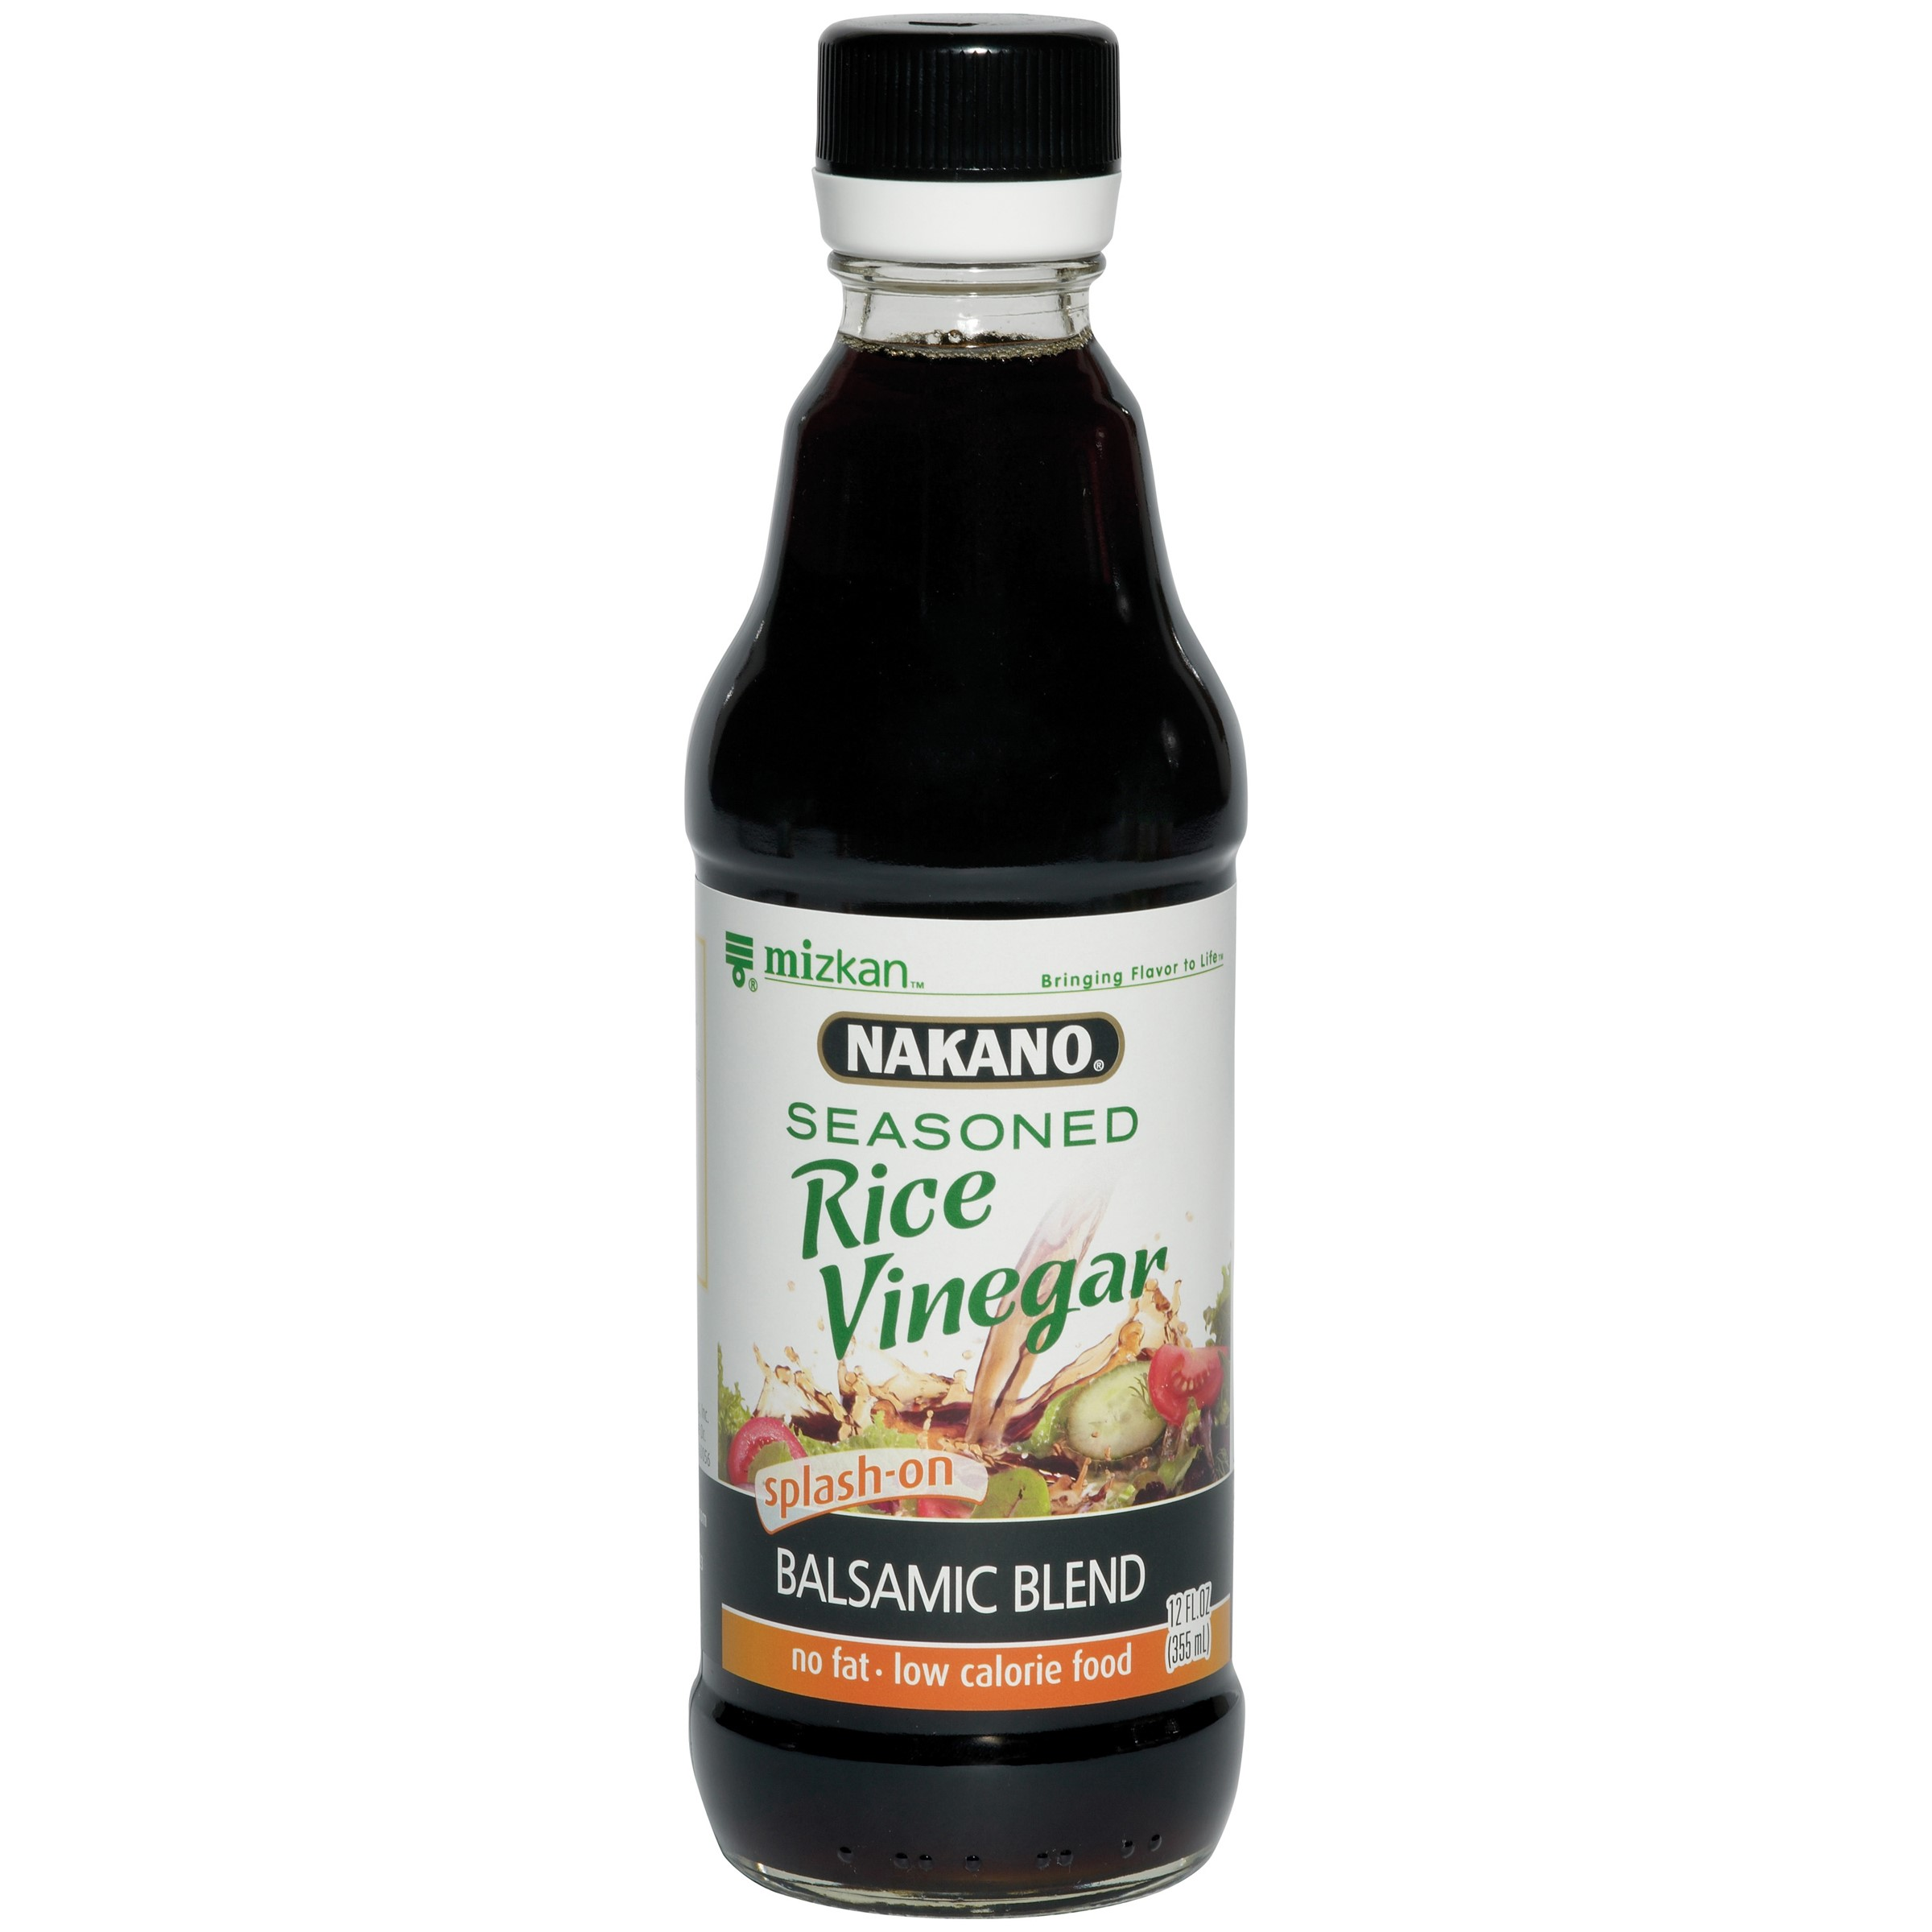 Nakano Rice Vinegar Seasoned Balsamic Blend 12 fl oz